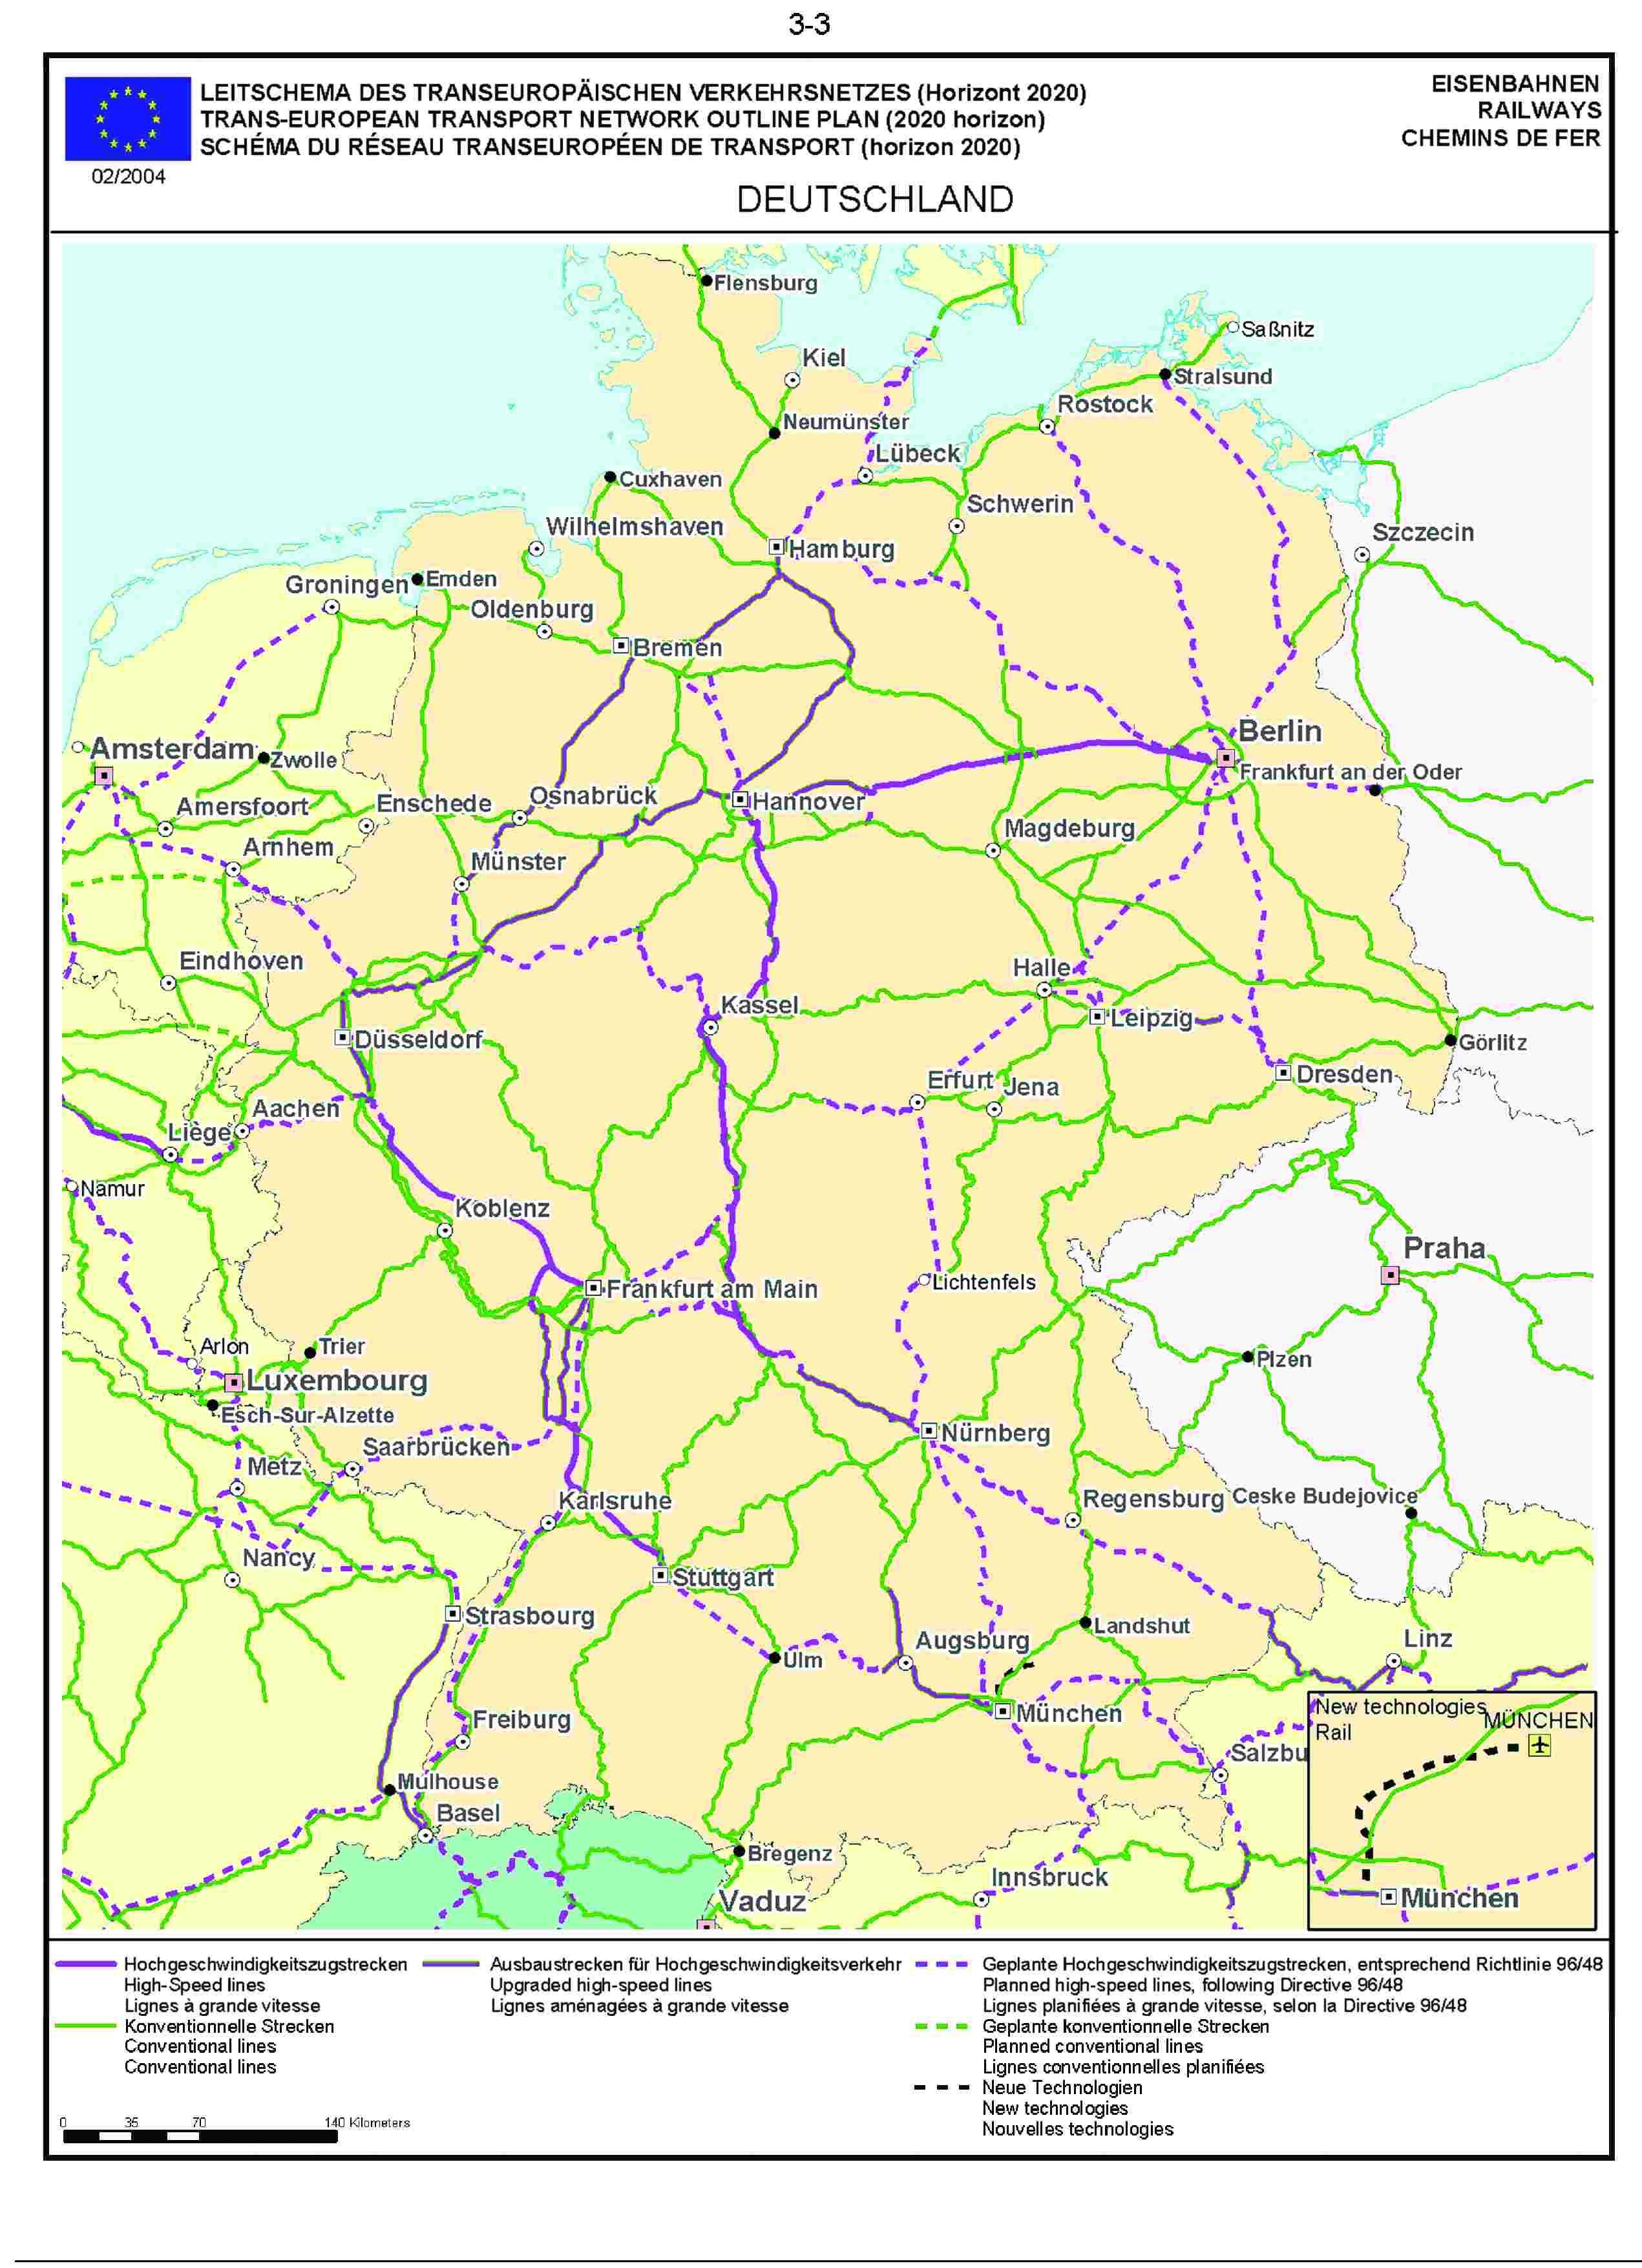 3.3LEITSCHEMA DES TRANSEUROPÄISCHEN VERKEHRSNETZES (Horizont 2020) EISENBAHNENTRANS-EUROPEAN TRANSPORT NETWORK OUTLINE PLAN (2020 horizon) RAILWAYSSCHÉMA DU RÉSEAU TRANSEUROPÉEN DE TRANSPORT (horizon 2020) CHEMINS DE FER02/2004DEUTSCHLAND